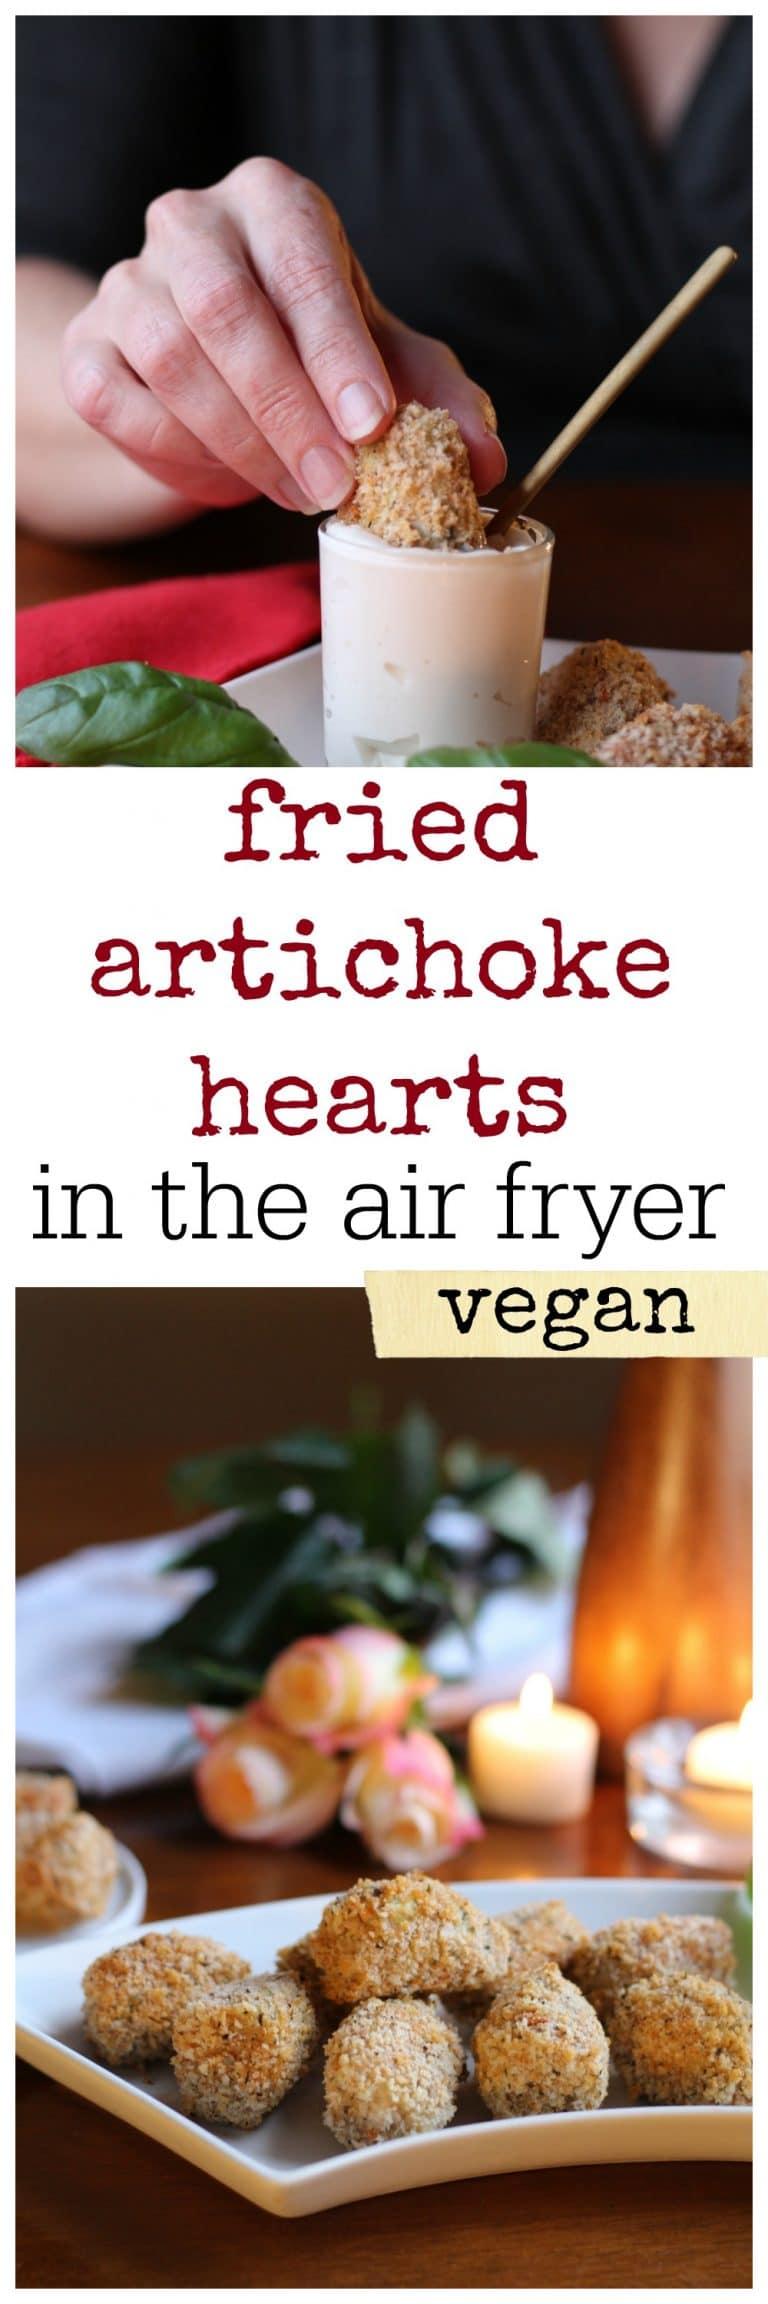 Vegan fried artichoke hearts - in the air fryer! Dip these crisp bites into vegan aioli with lemon and garlic. #vegan #aioli #appetizer #airfryer #starter #recipe #artichokes